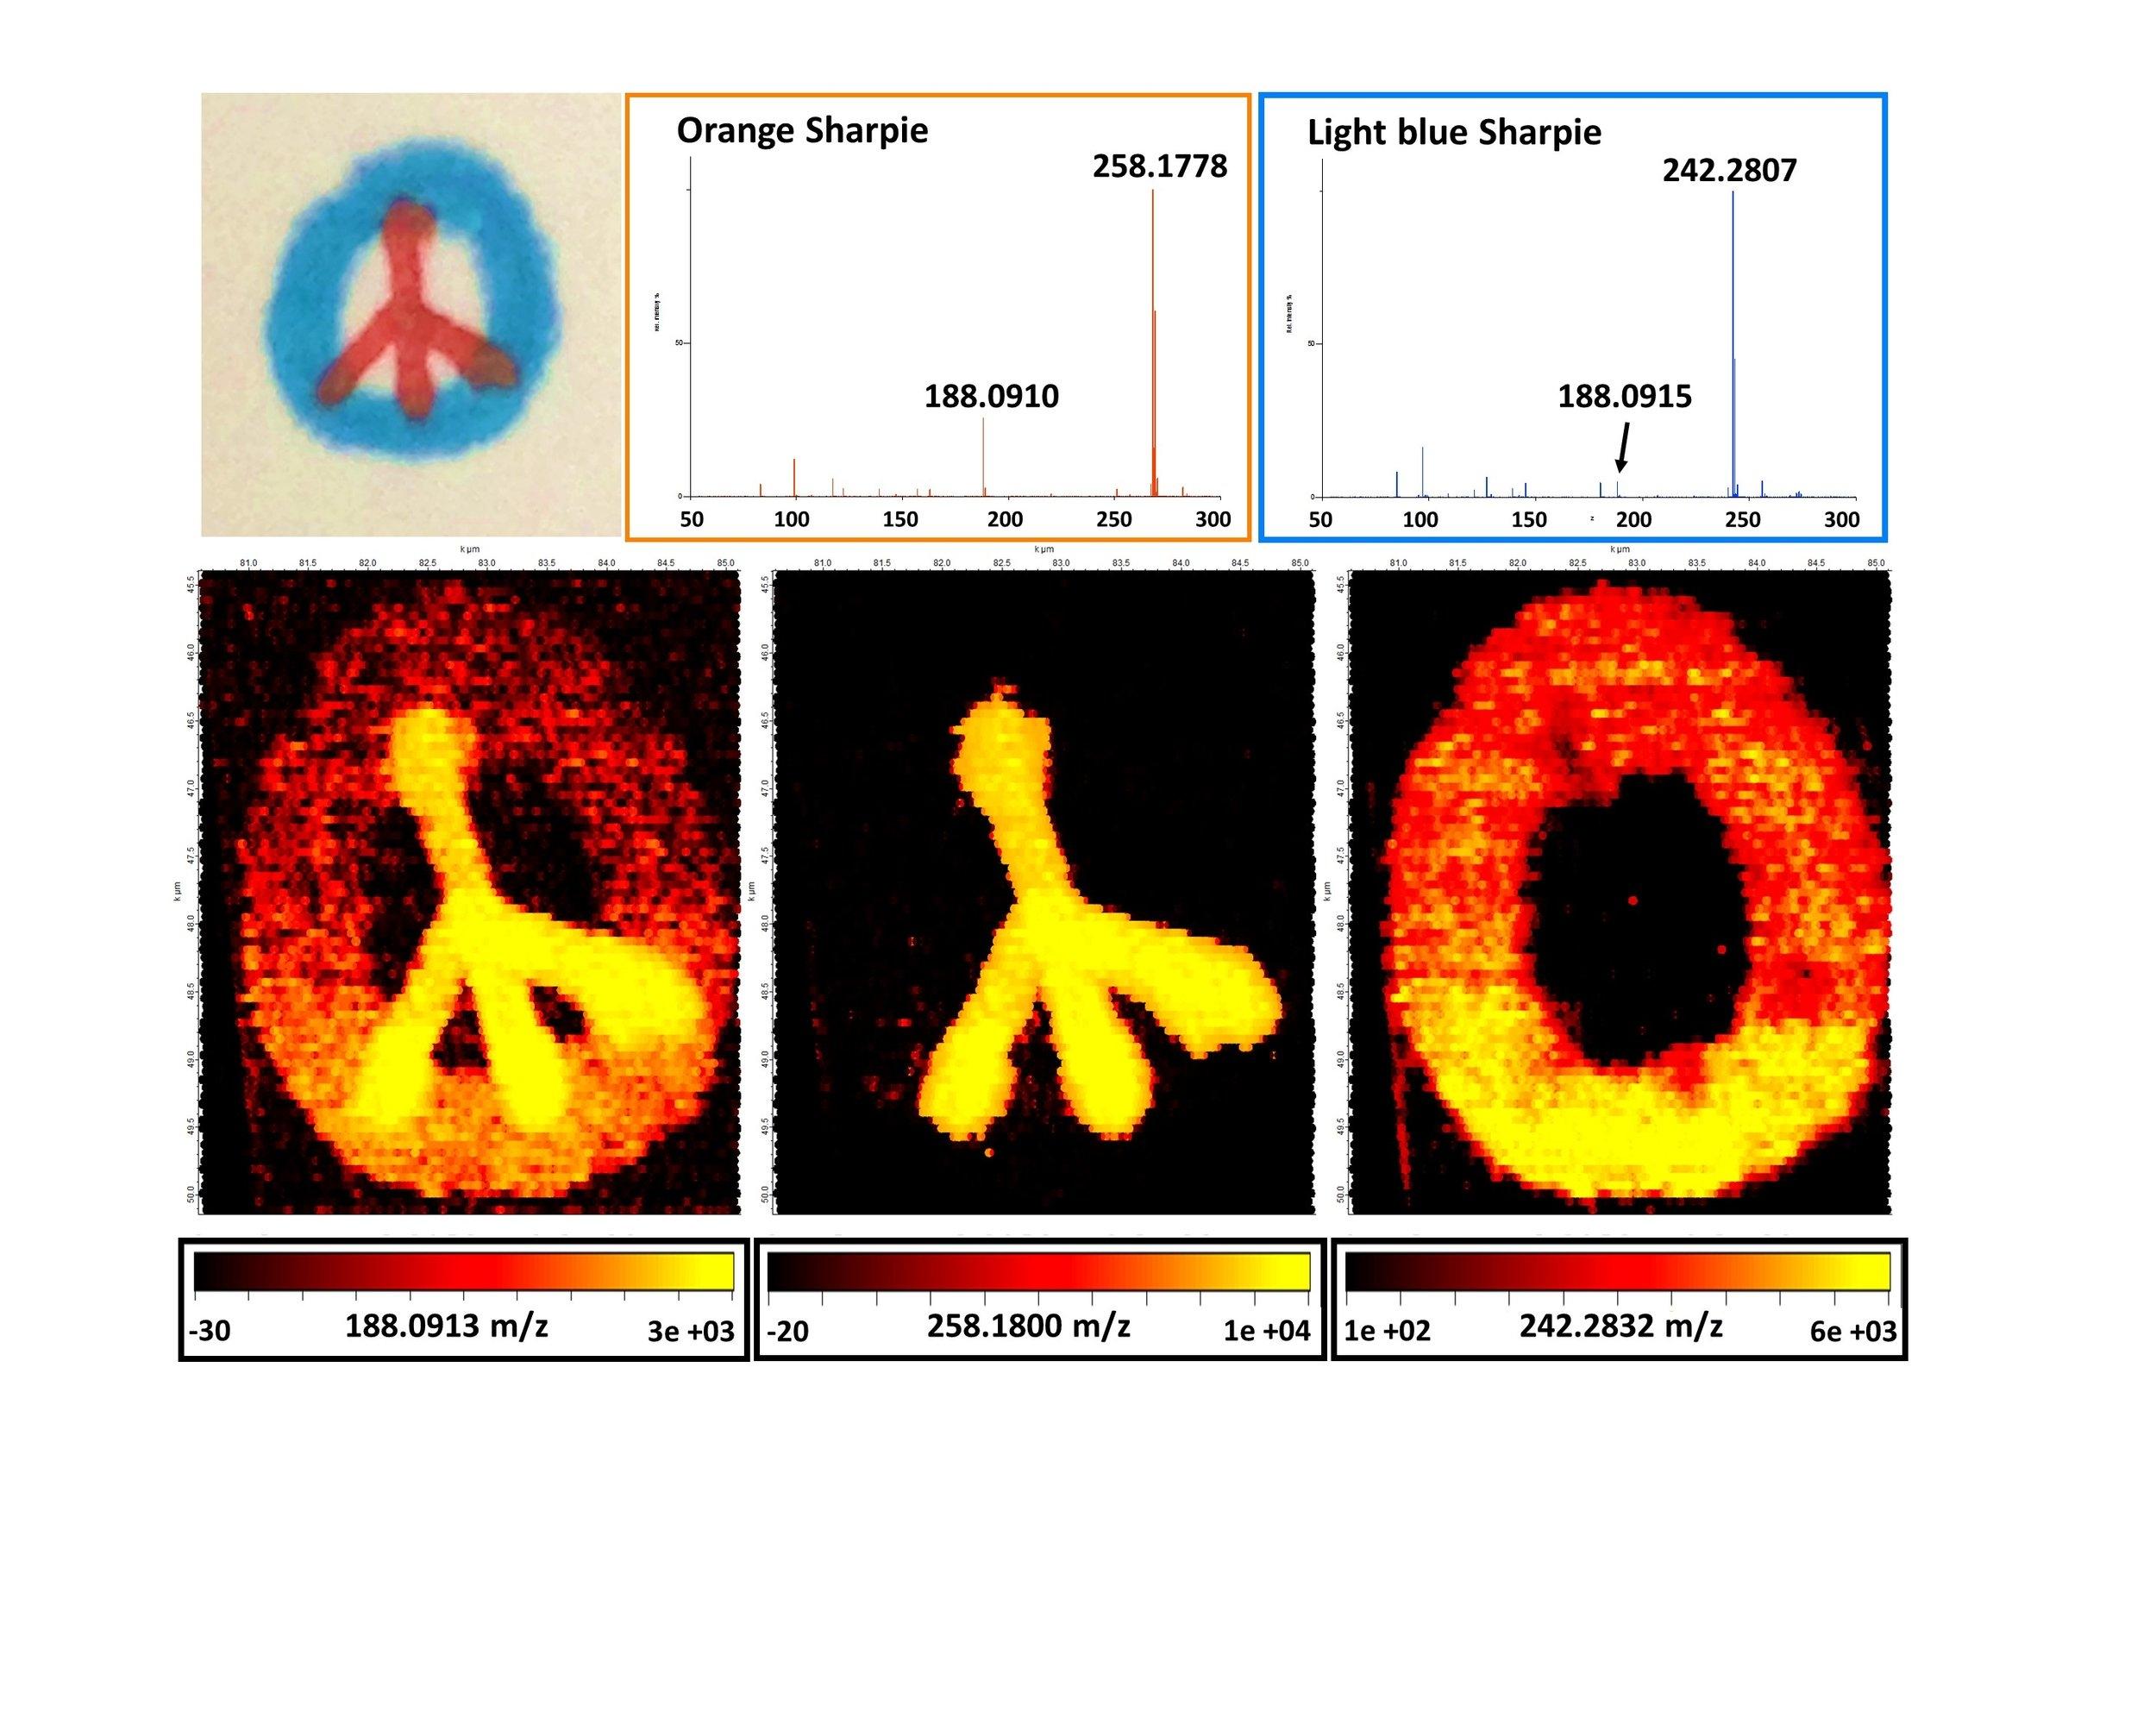 Angewandte Chemie Images-peace sign.jpg